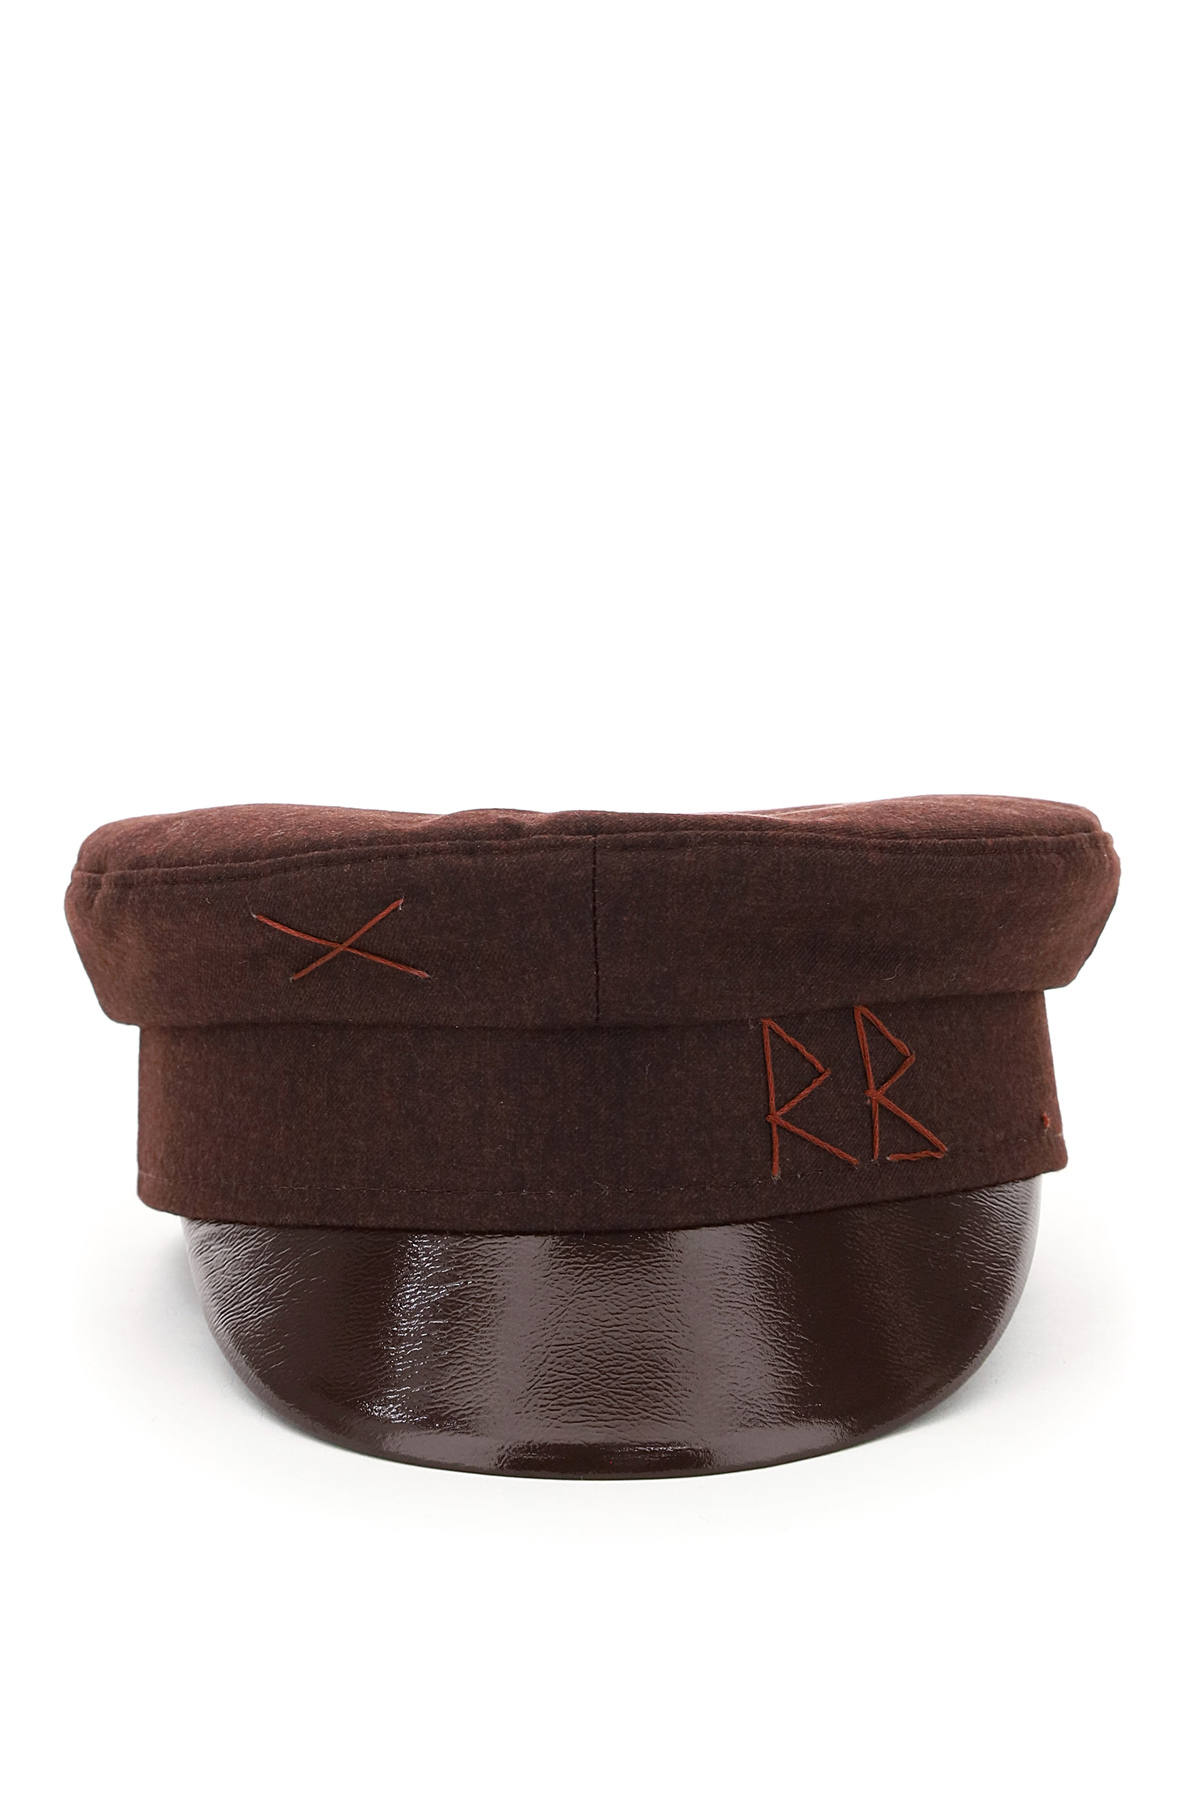 Ruslan baginskiy cappello baker boy ricamo rb